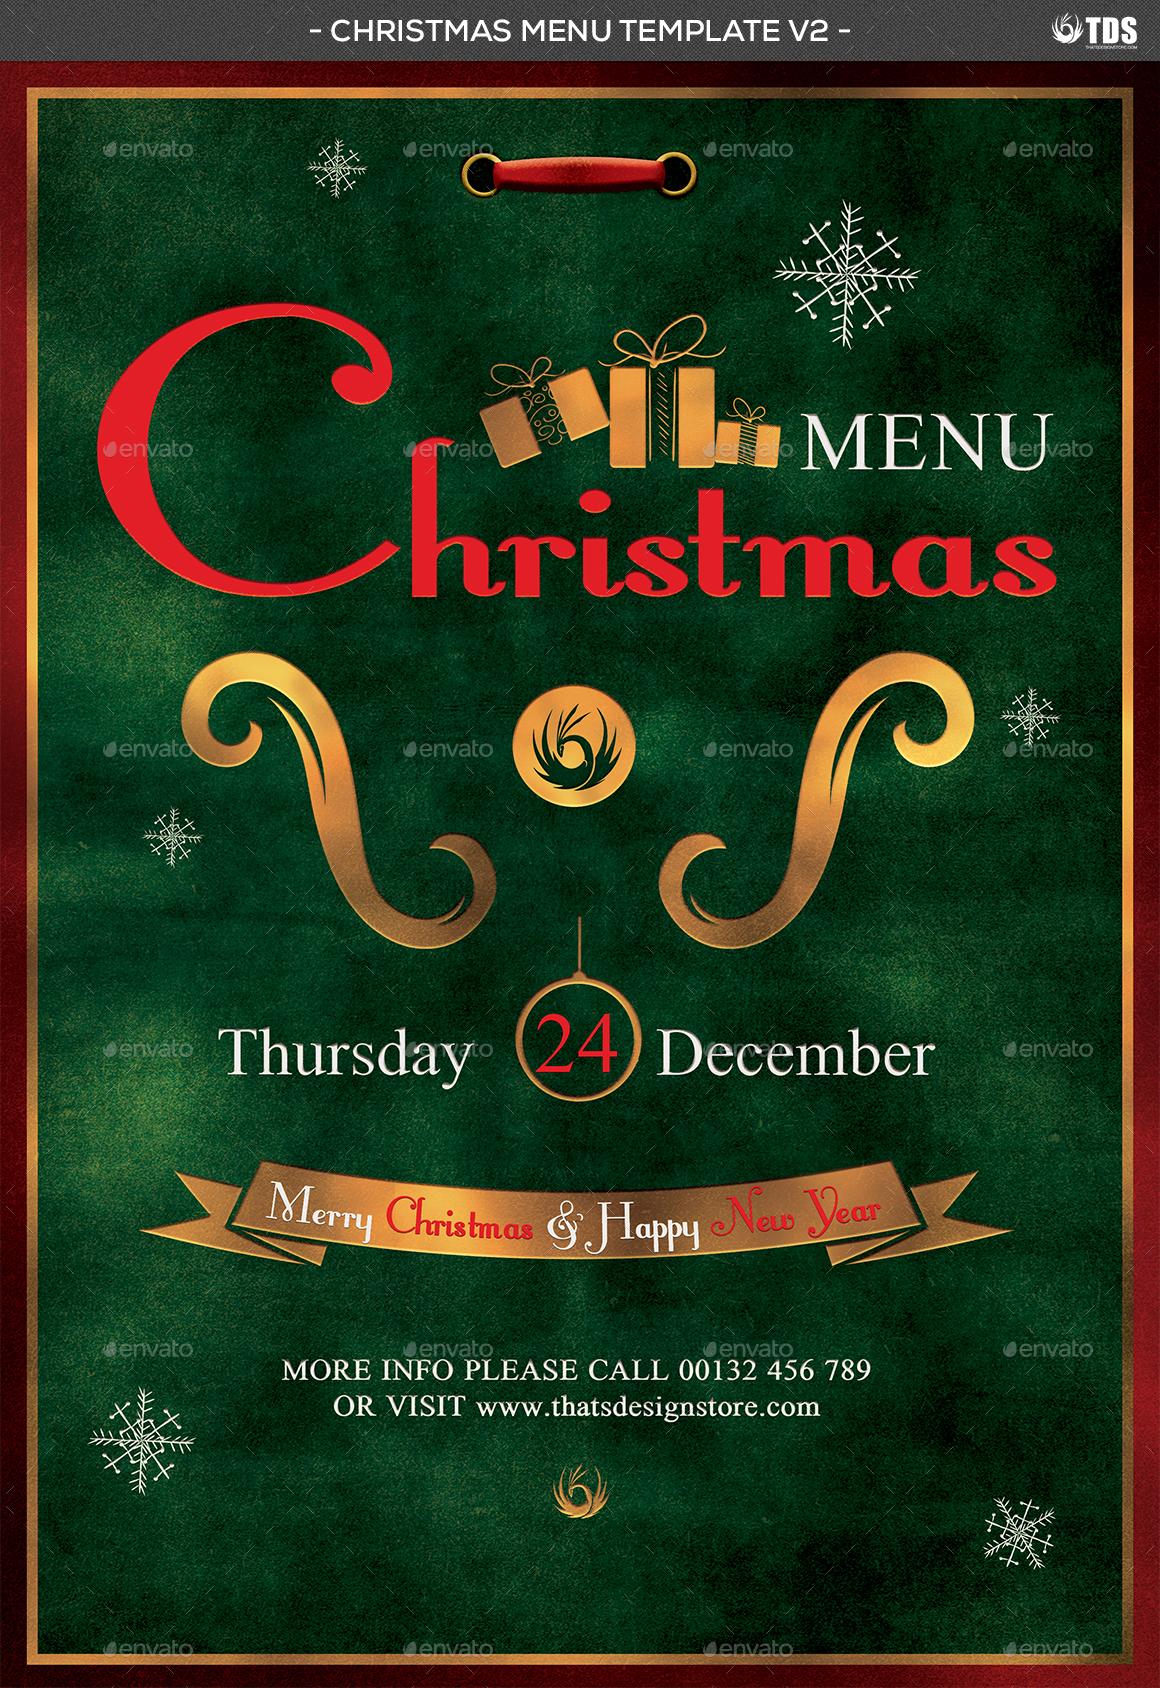 christmas menu template v2 by lou606 graphicriver 01 christmas menu template v2 jpg 02 christmas menu template v2 jpg 03 christmas menu template v2 jpg